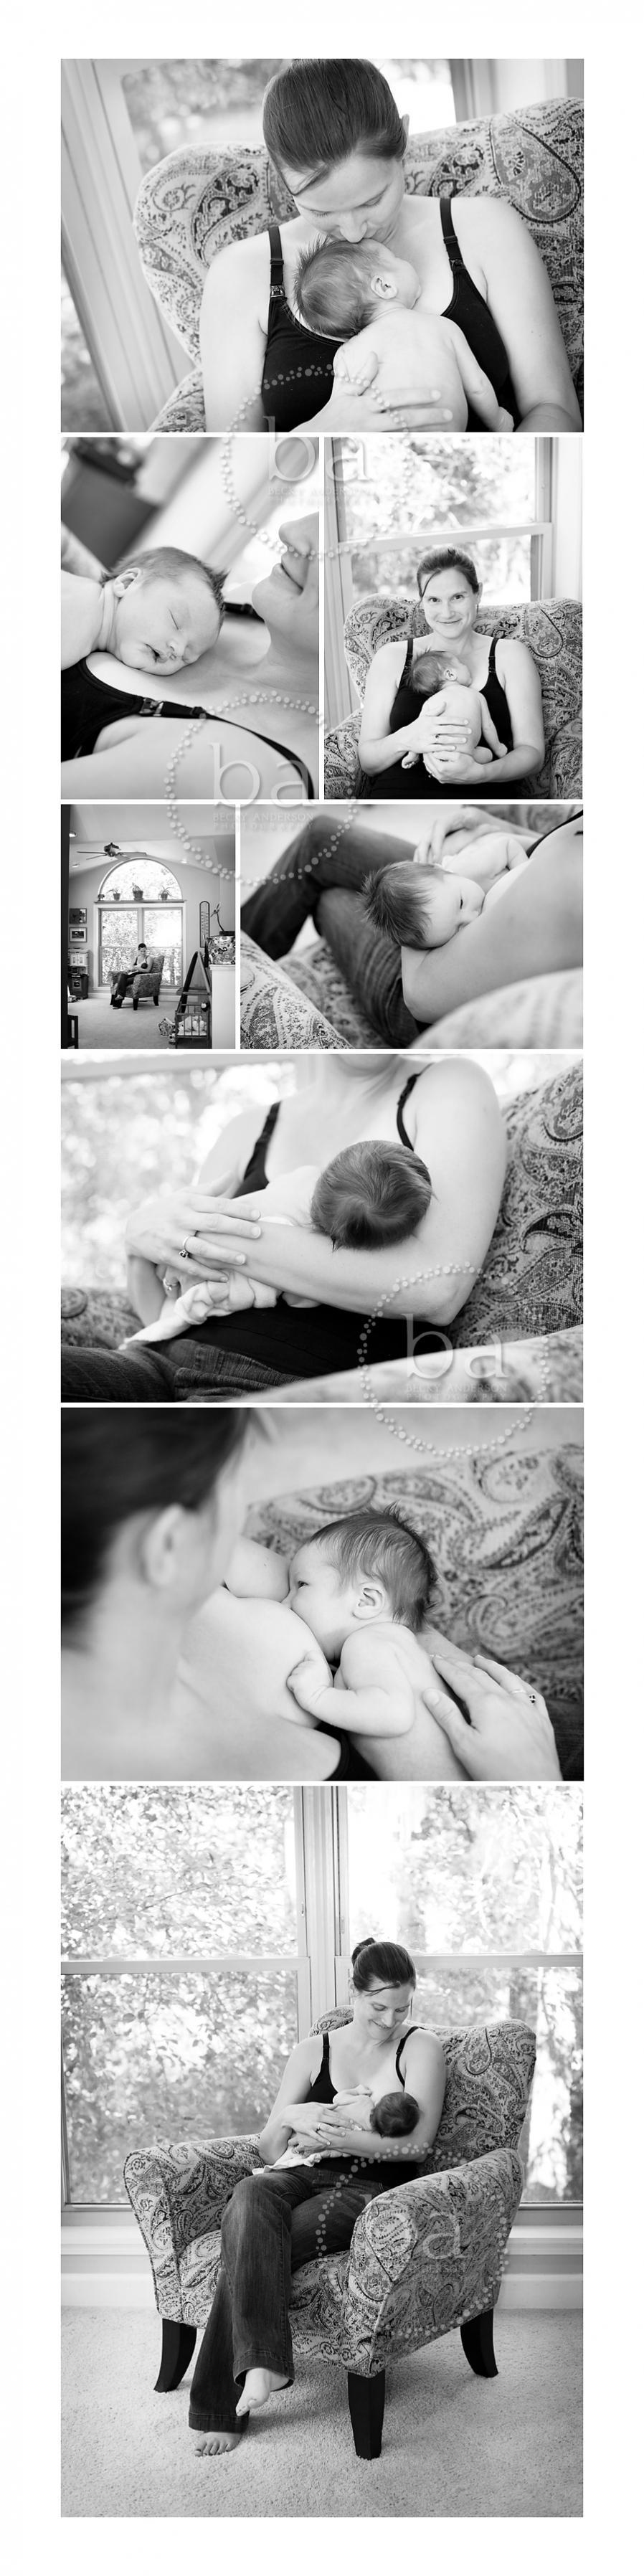 Kalamazoo newborn photography of breastfeeding mom